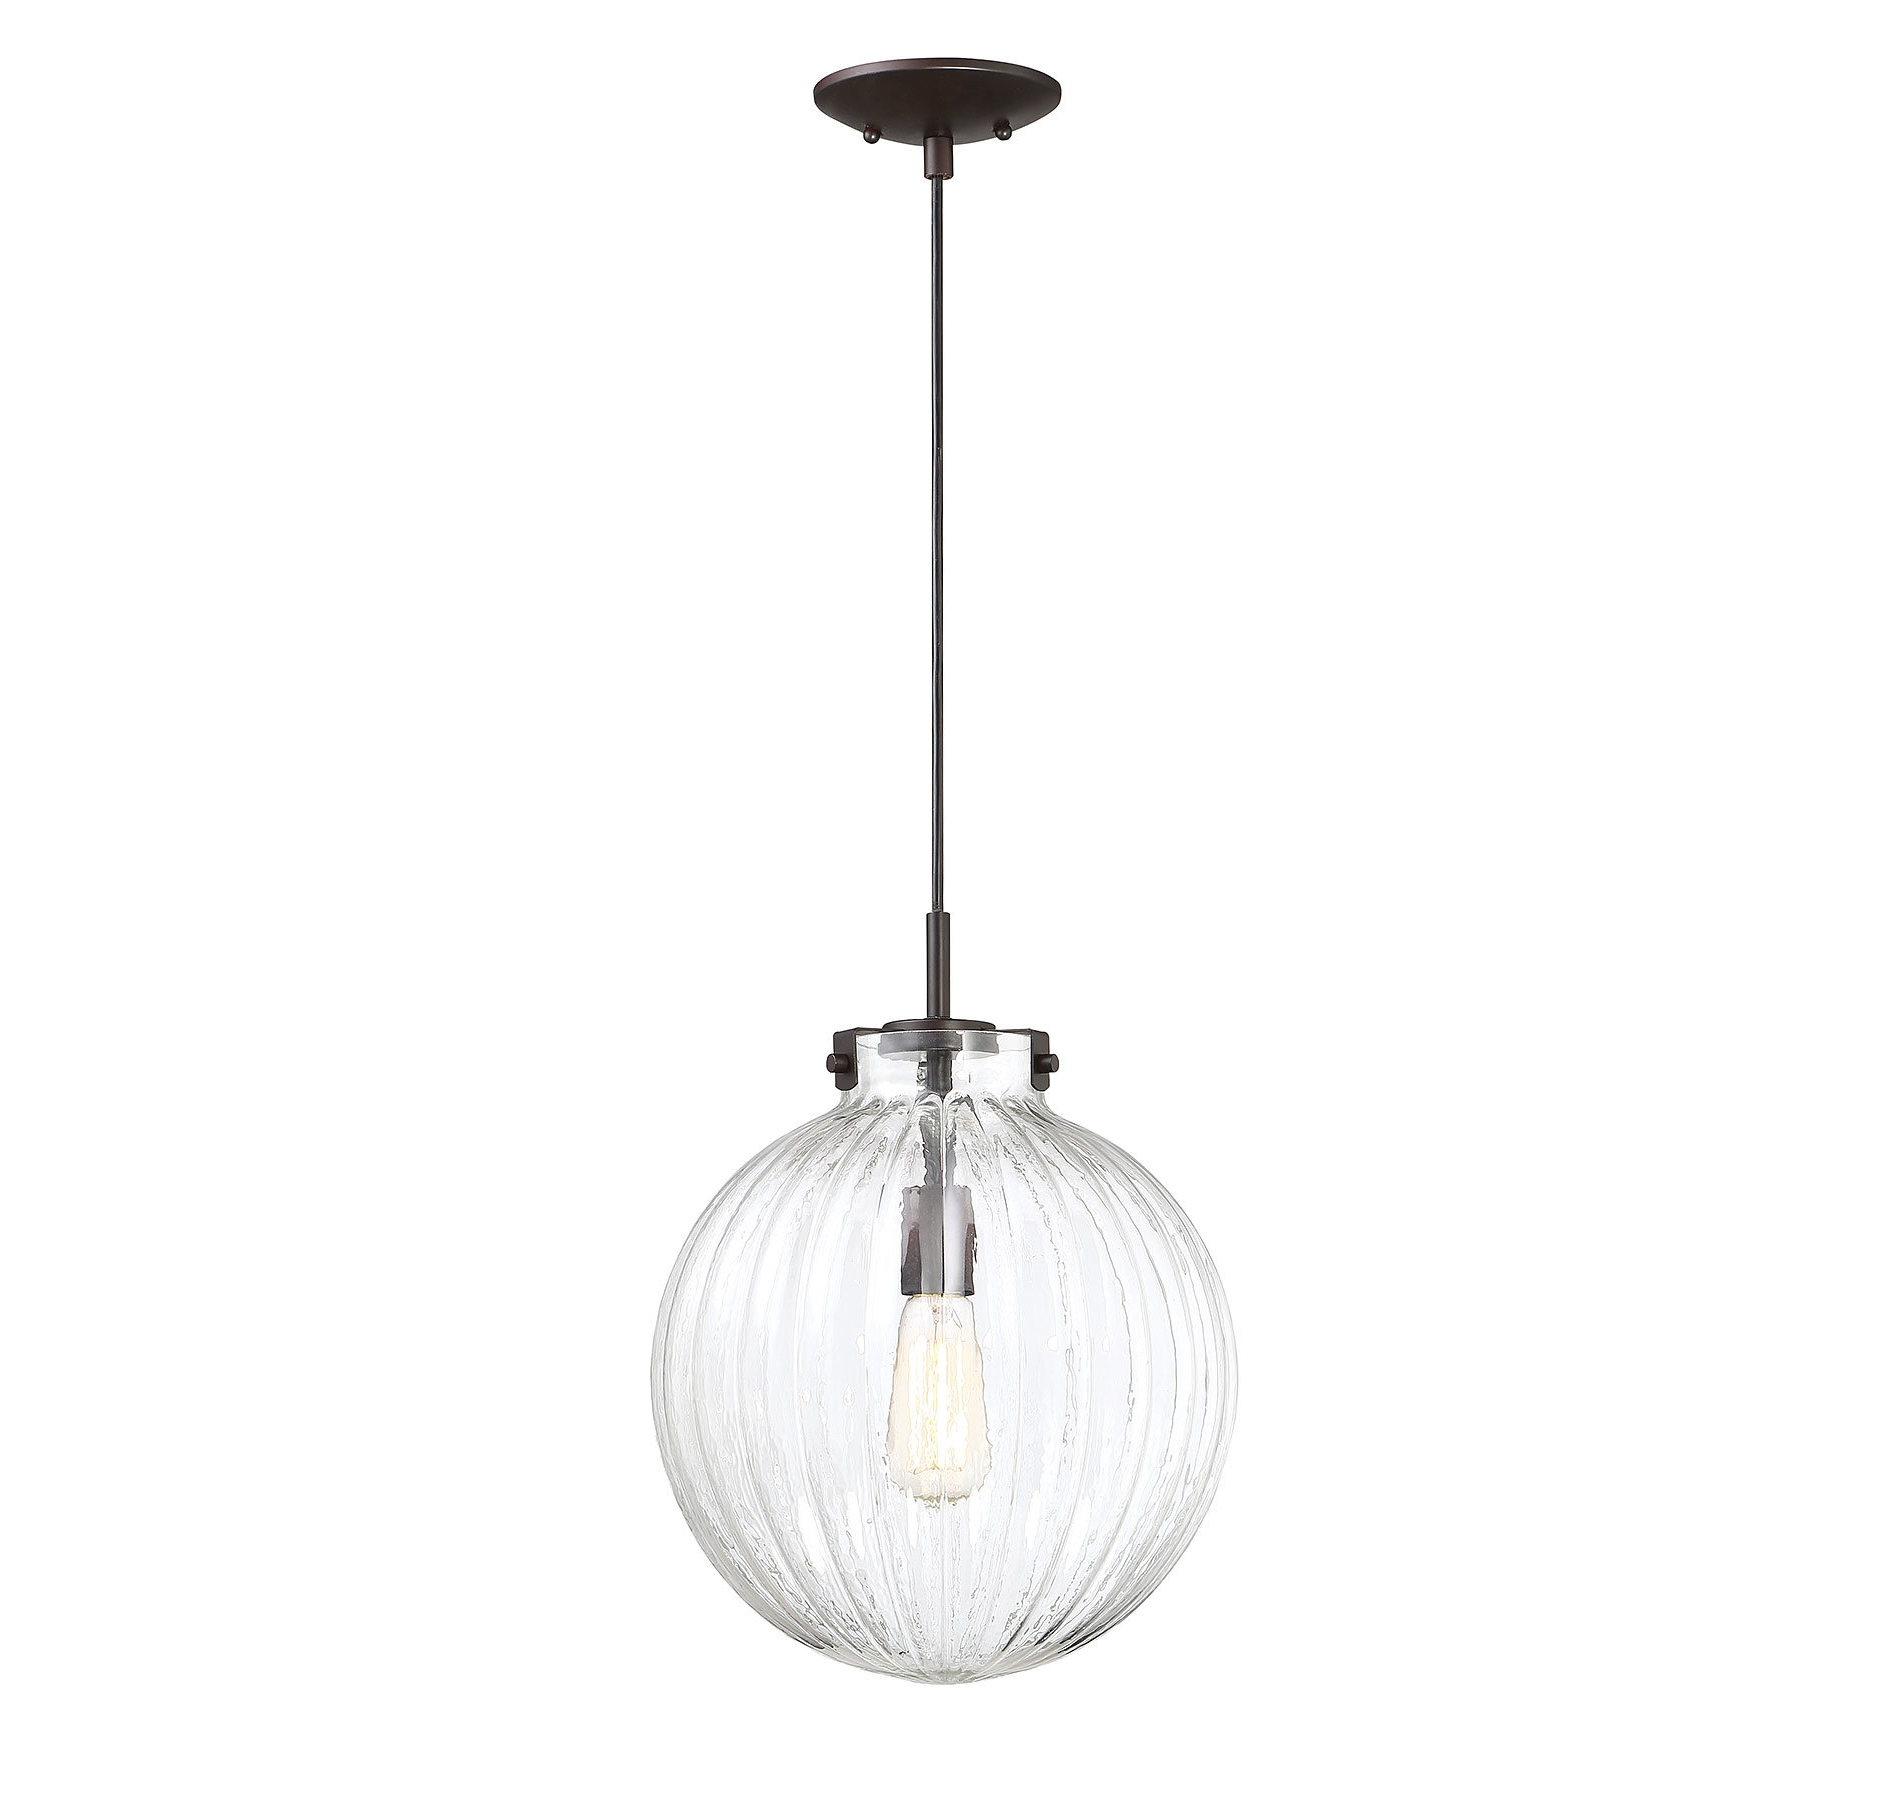 2020 Cayden 1 Light Single Globe Pendants Regarding Nevels 1 Light Single Globe Pendant (View 3 of 25)